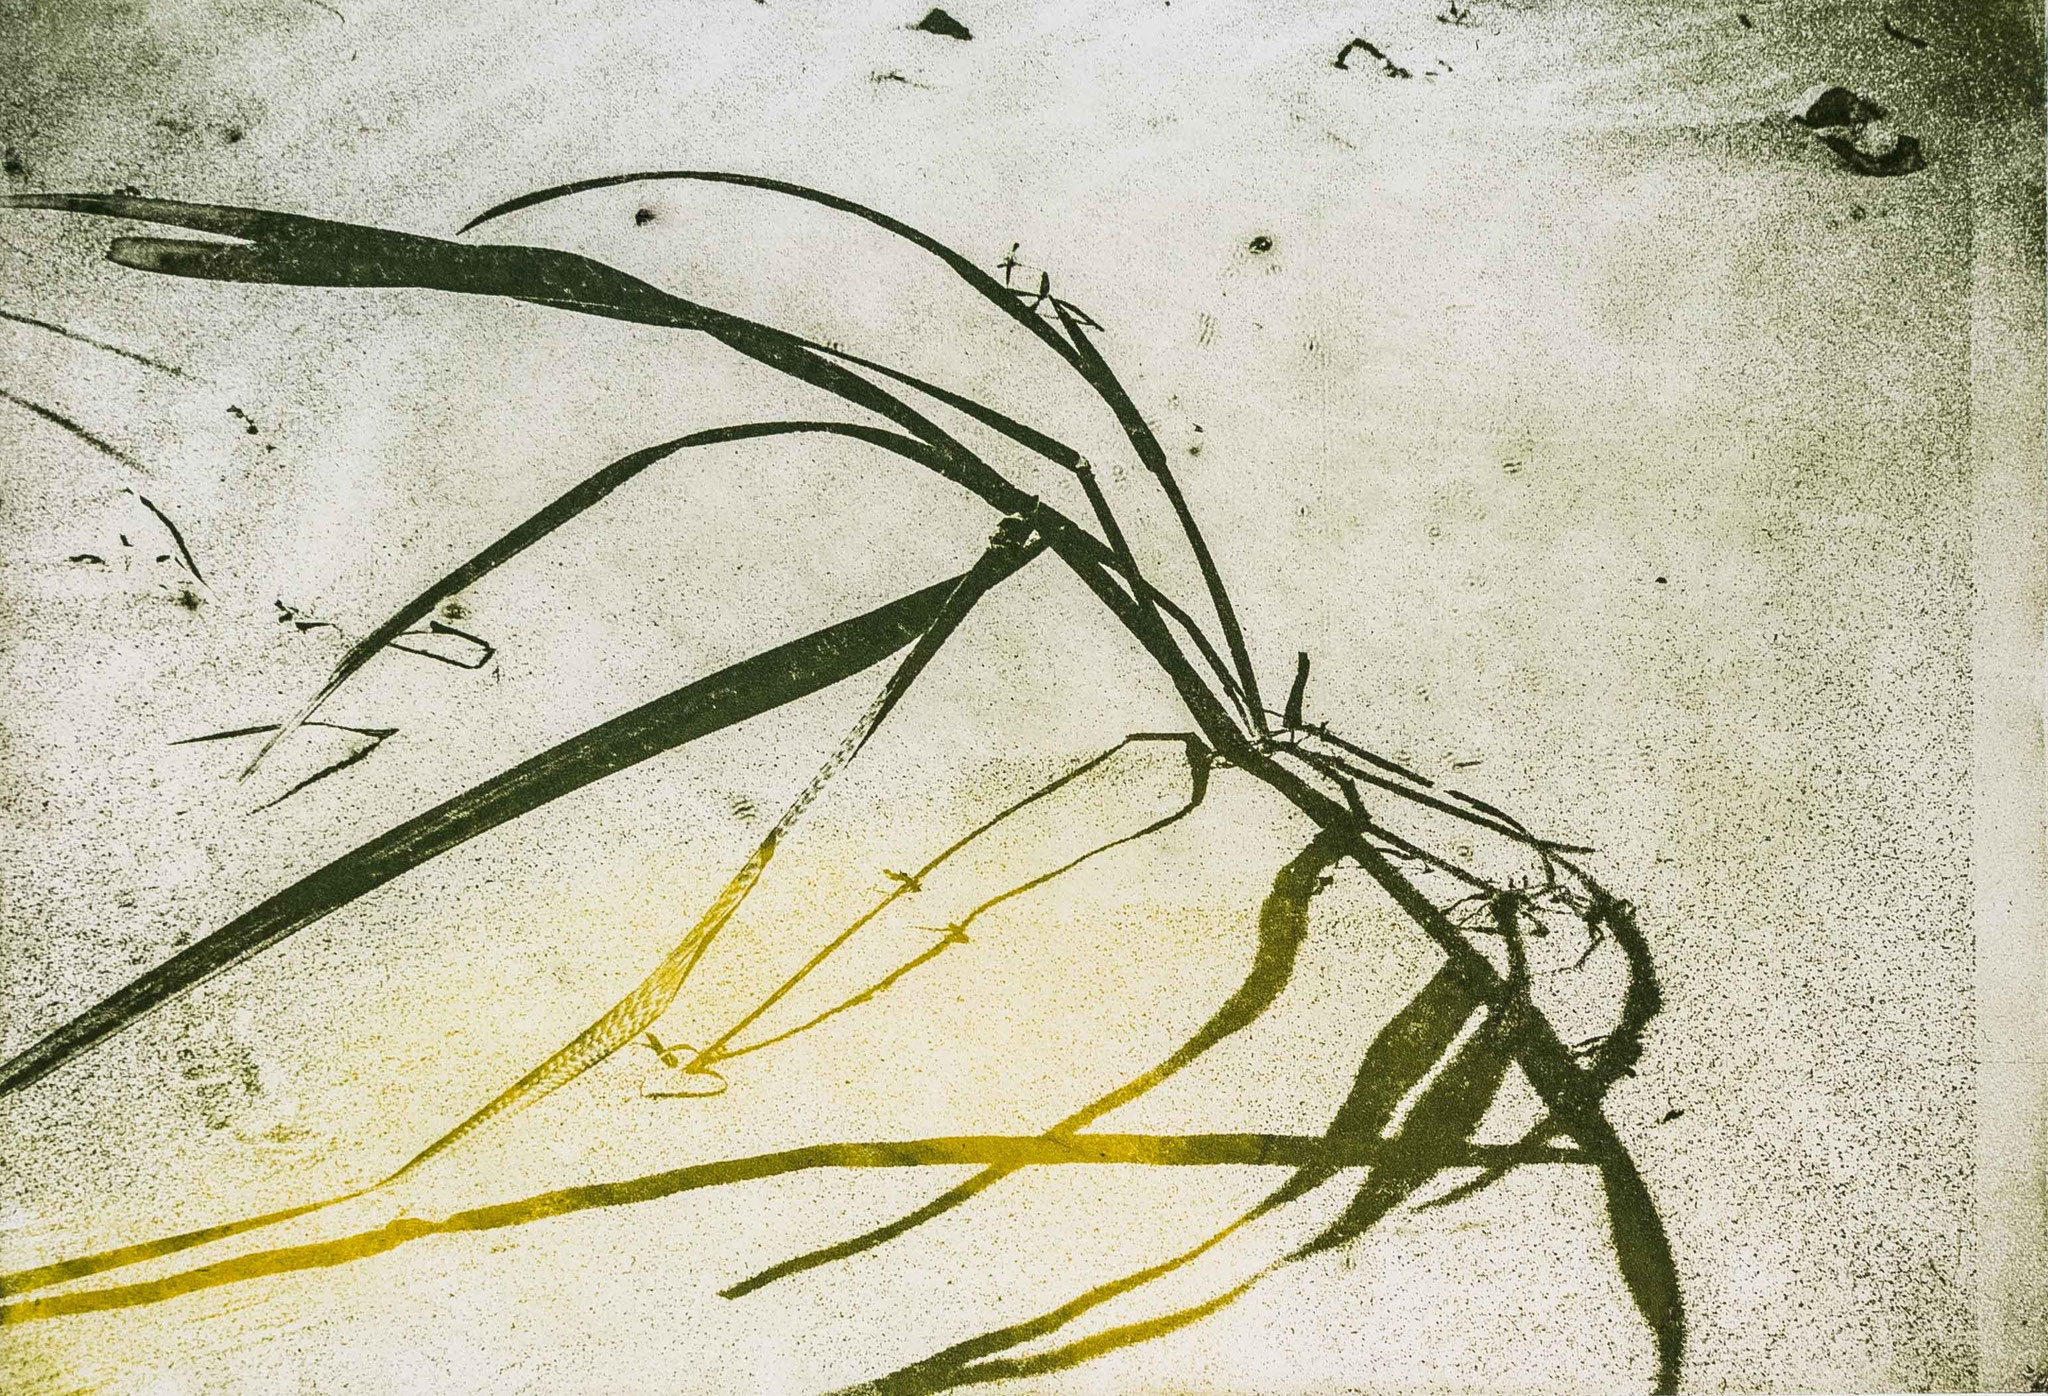 Intagliotypie, 20x30 cm, Strandhafer